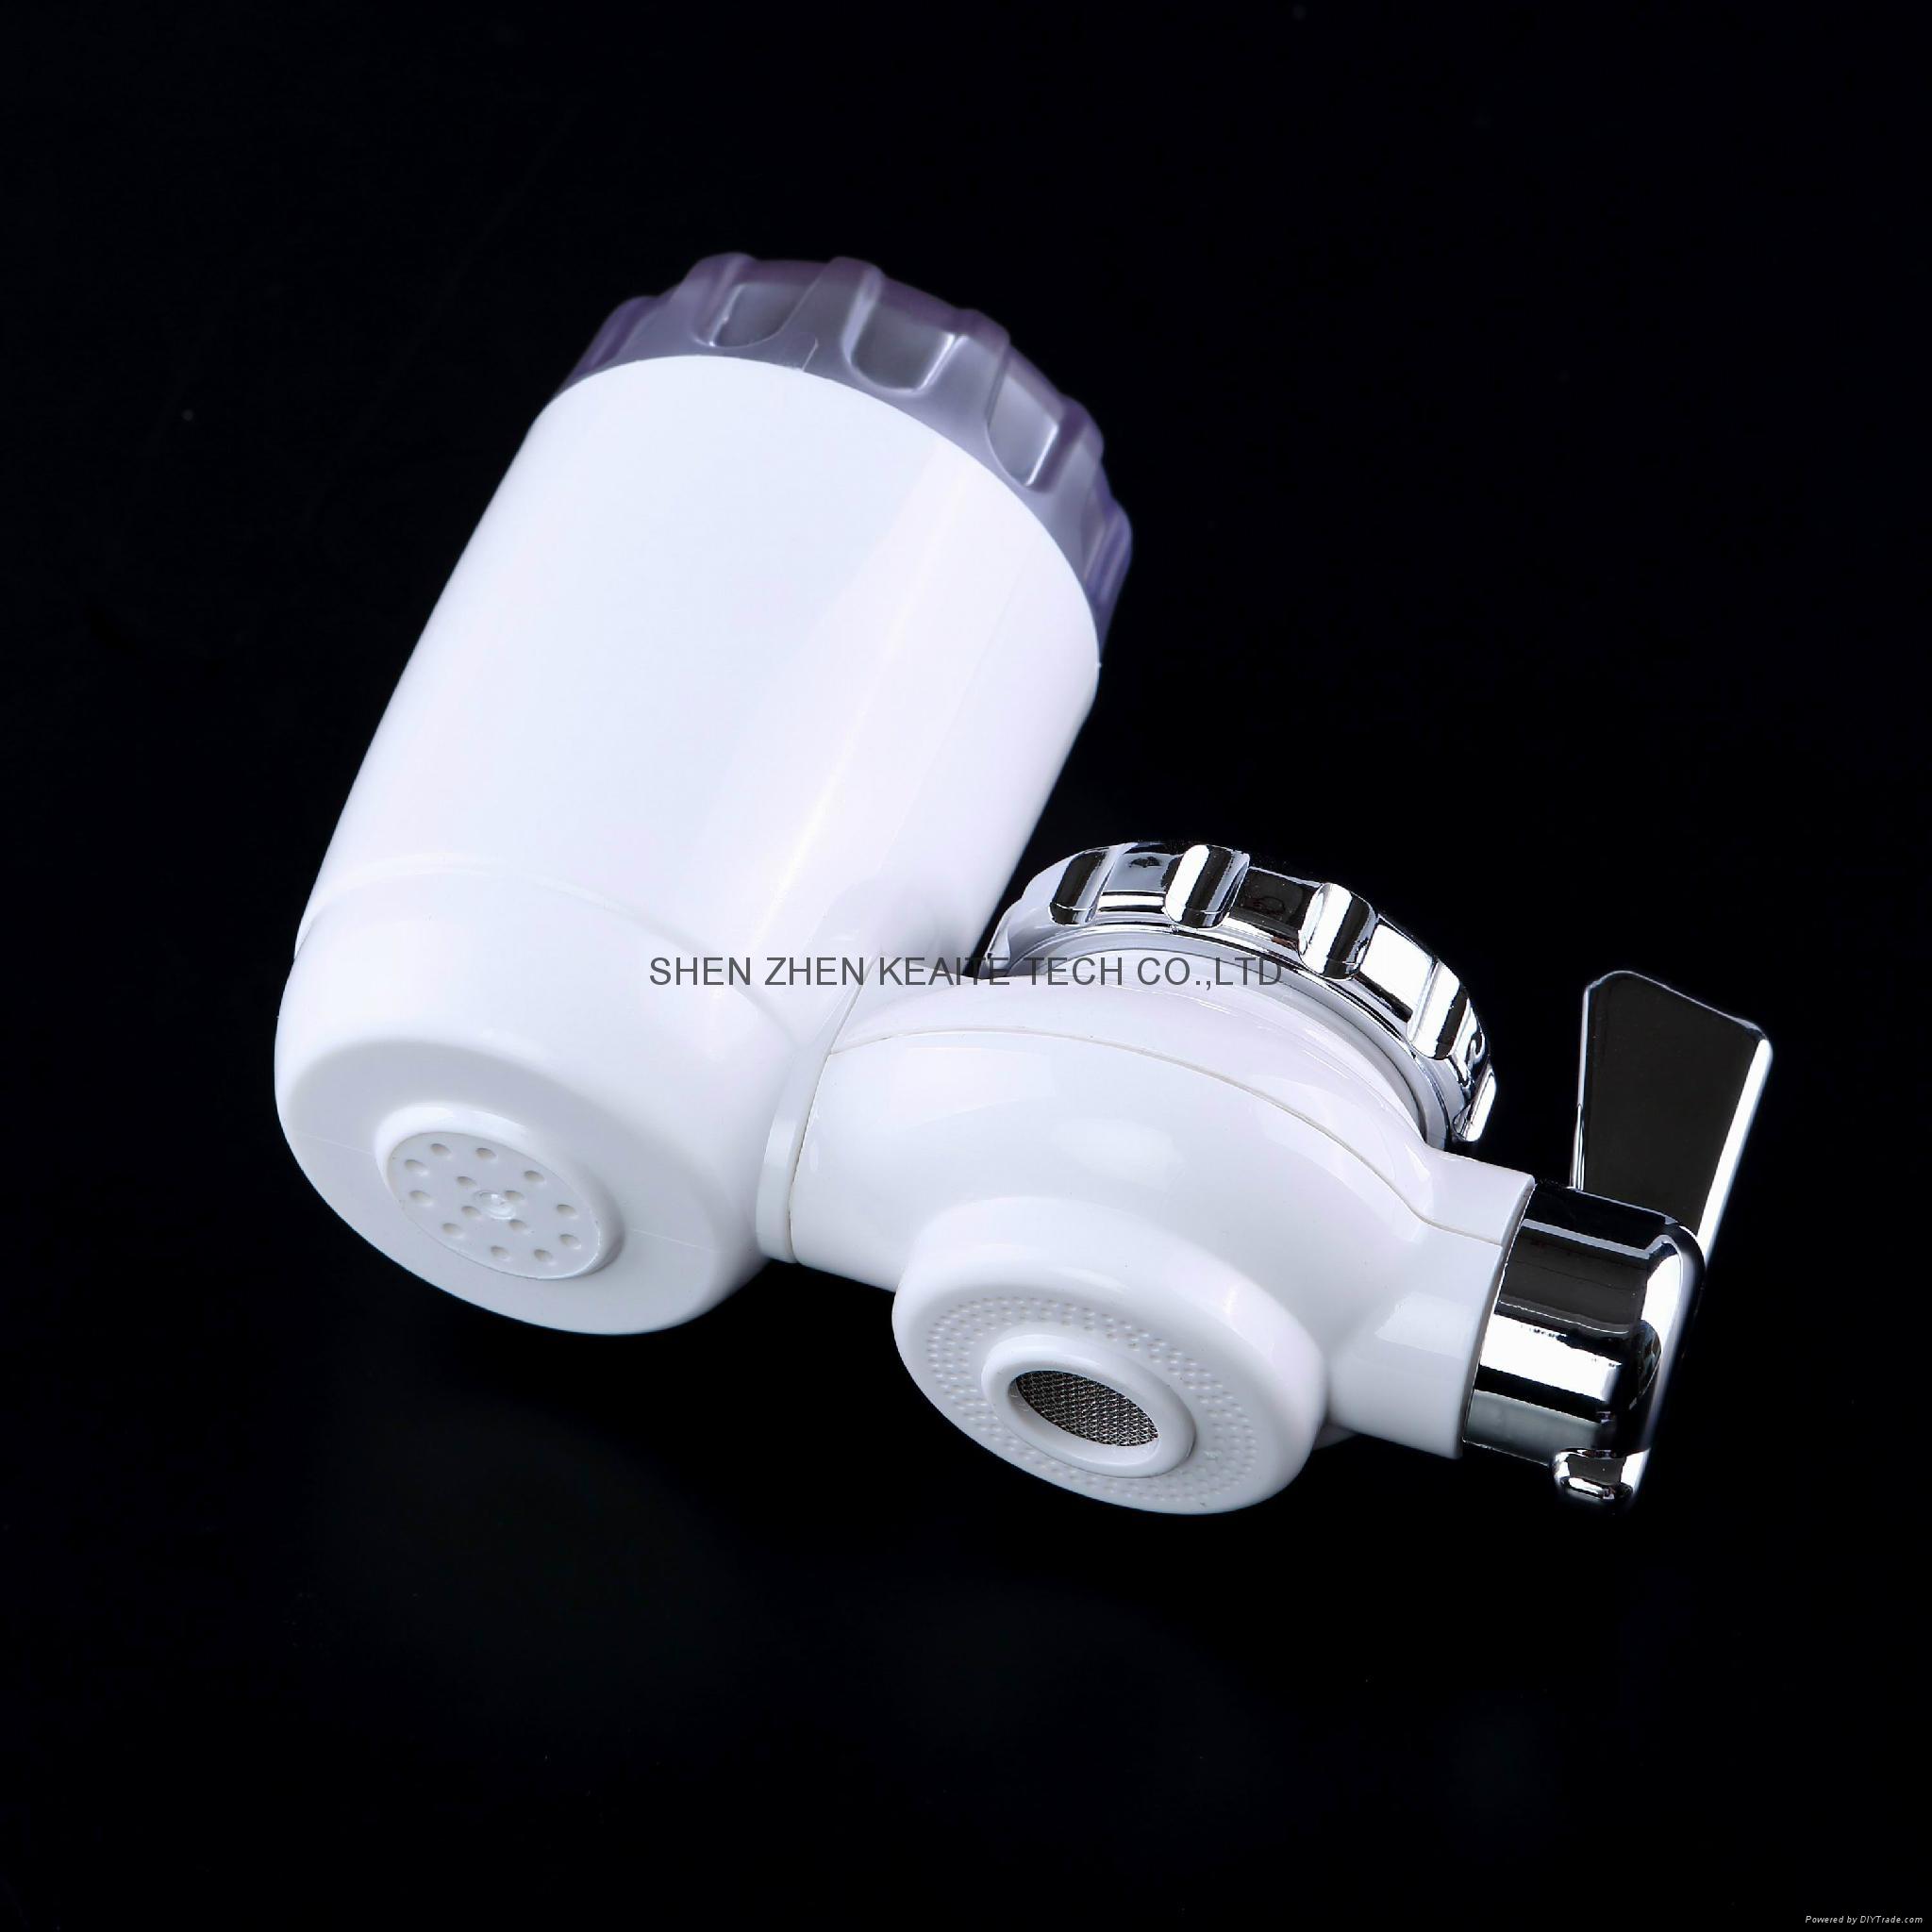 Faucet Water Purifier - KAT-1310 - KEAITE (China Manufacturer ...